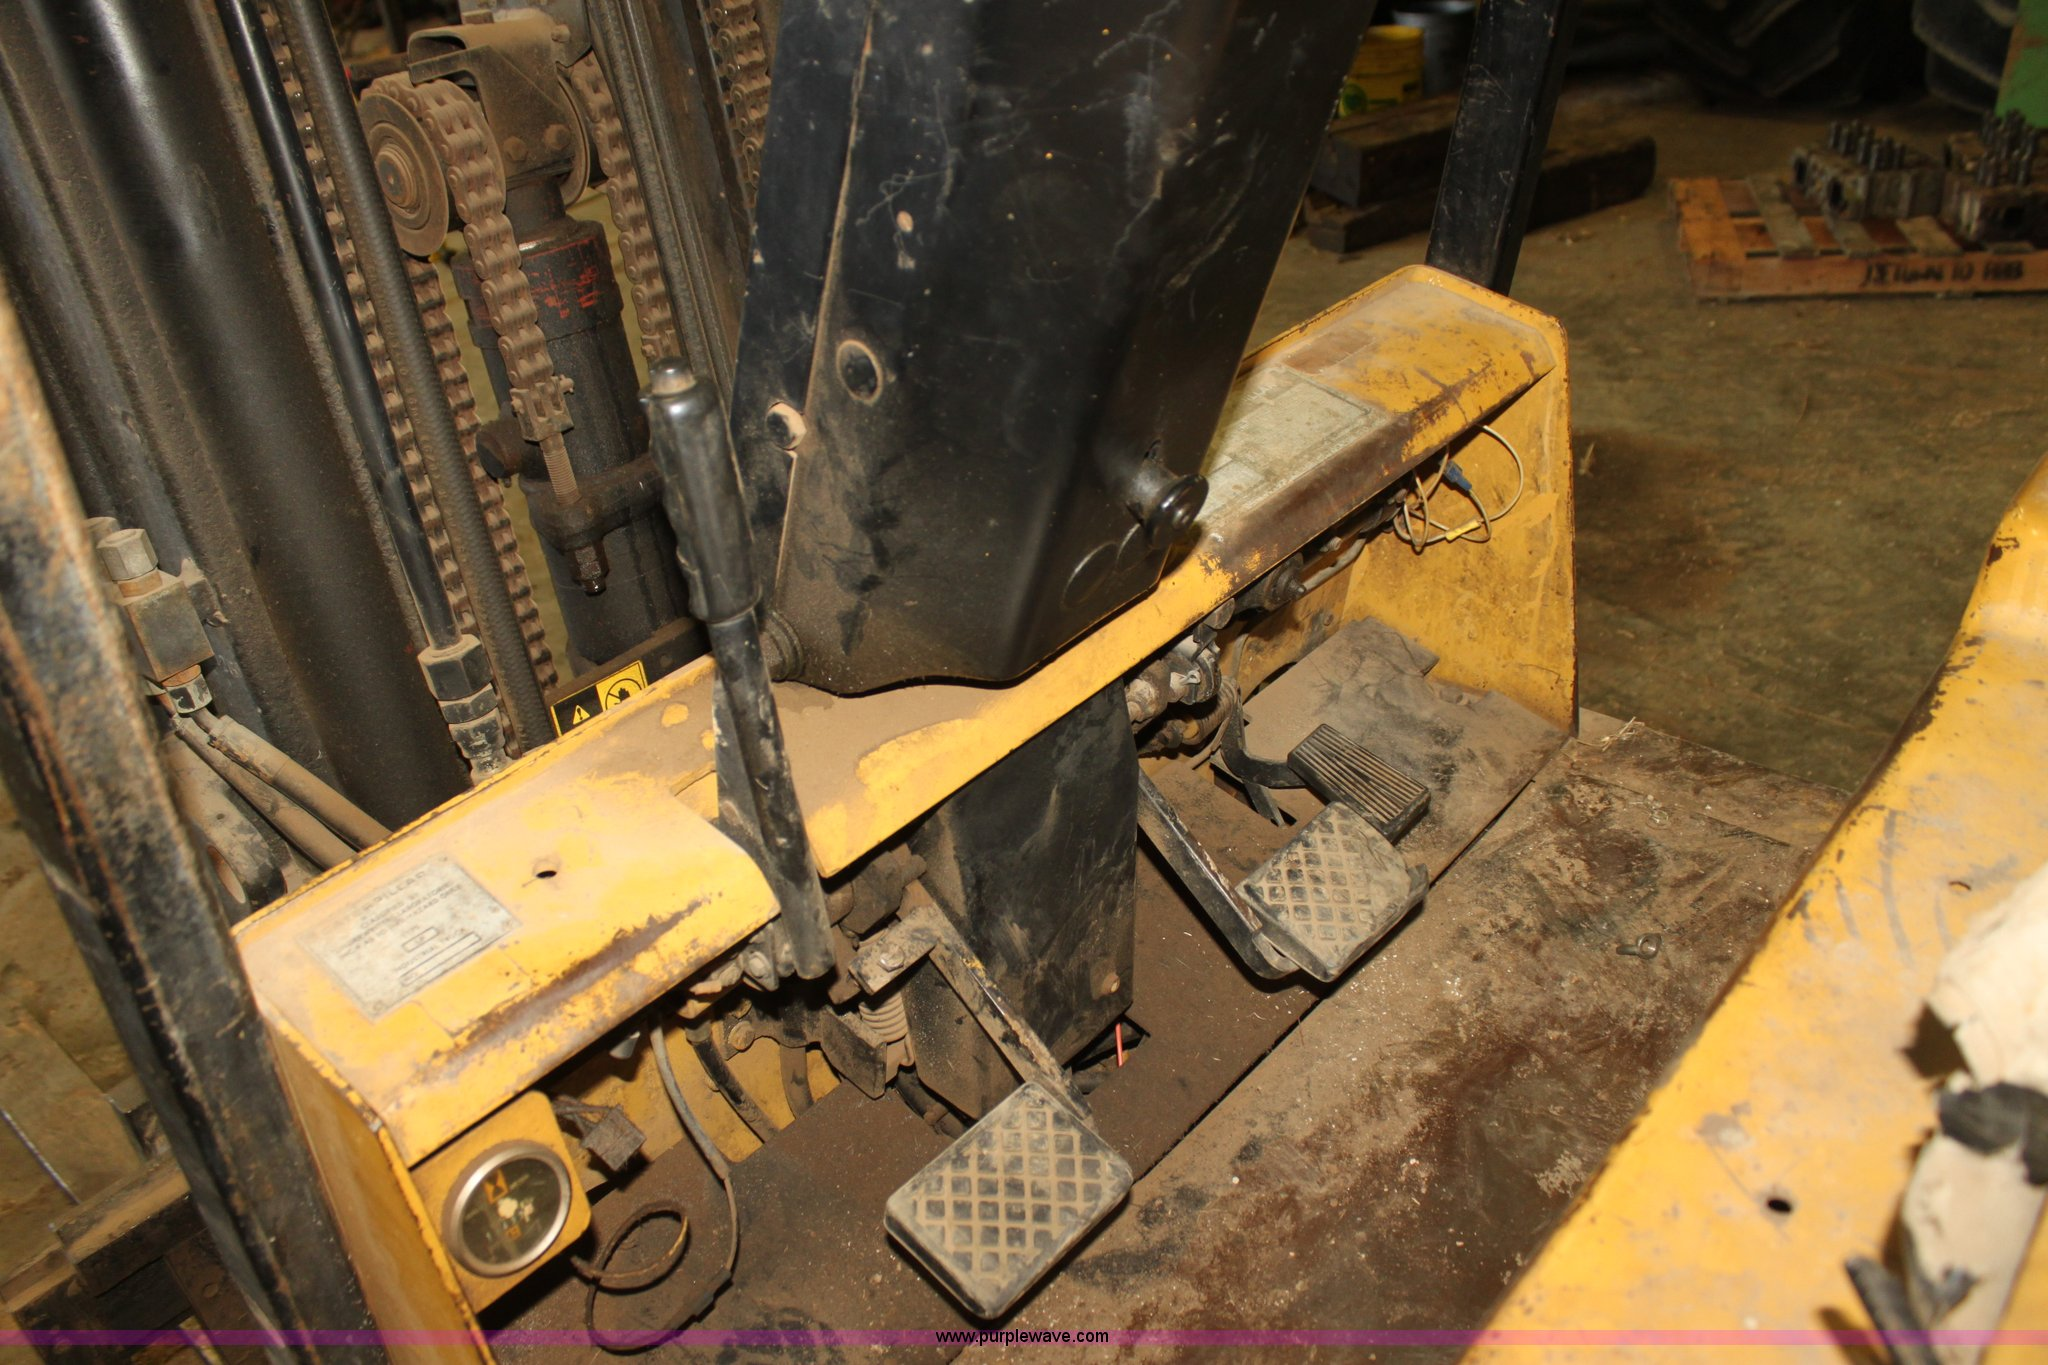 Caterpillar T50dsa Forklift maintenance Manual